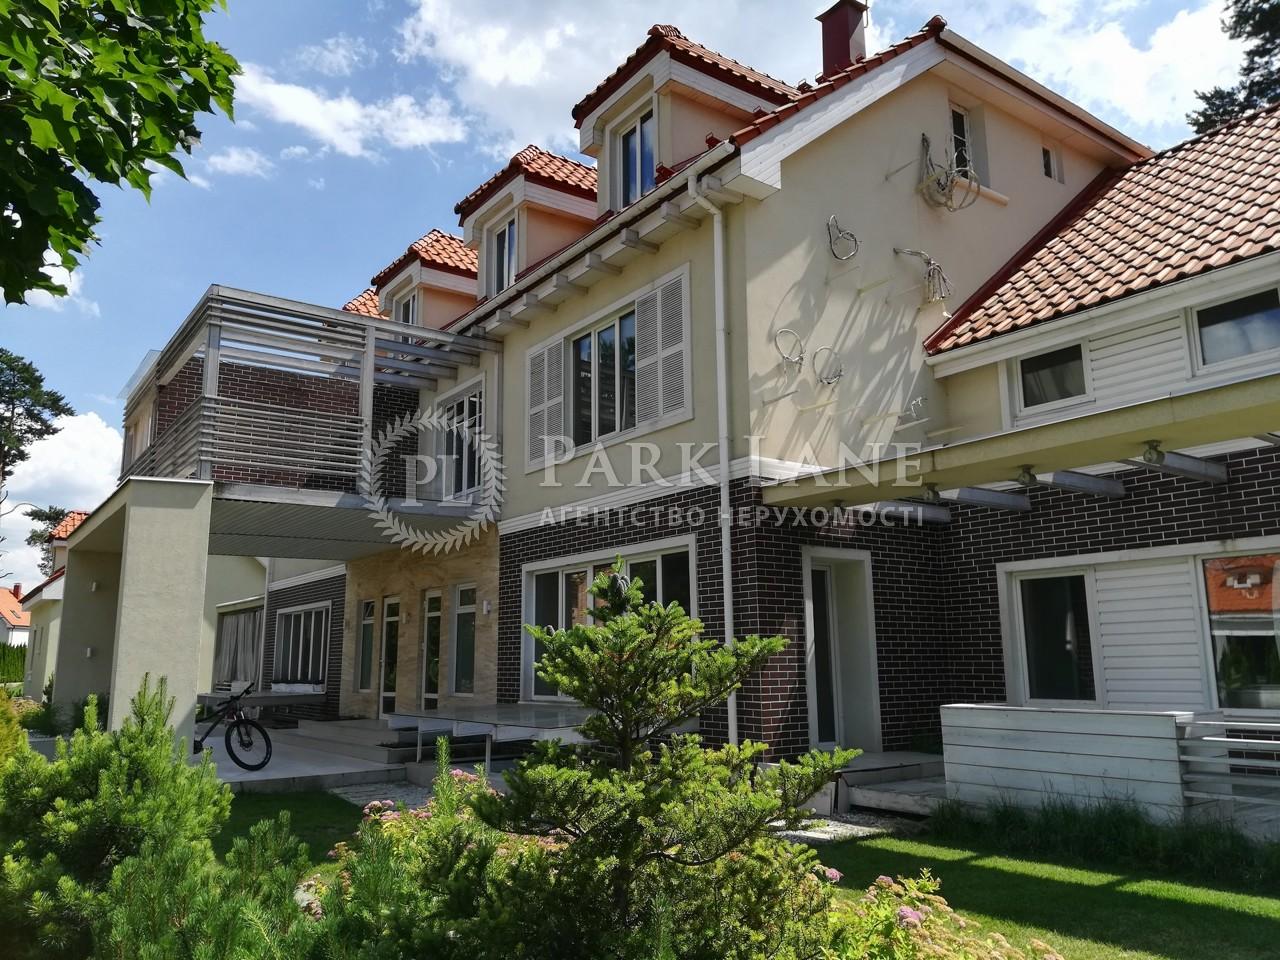 Квартира Столичное шоссе, 149, Киев, R-23588 - Фото 18